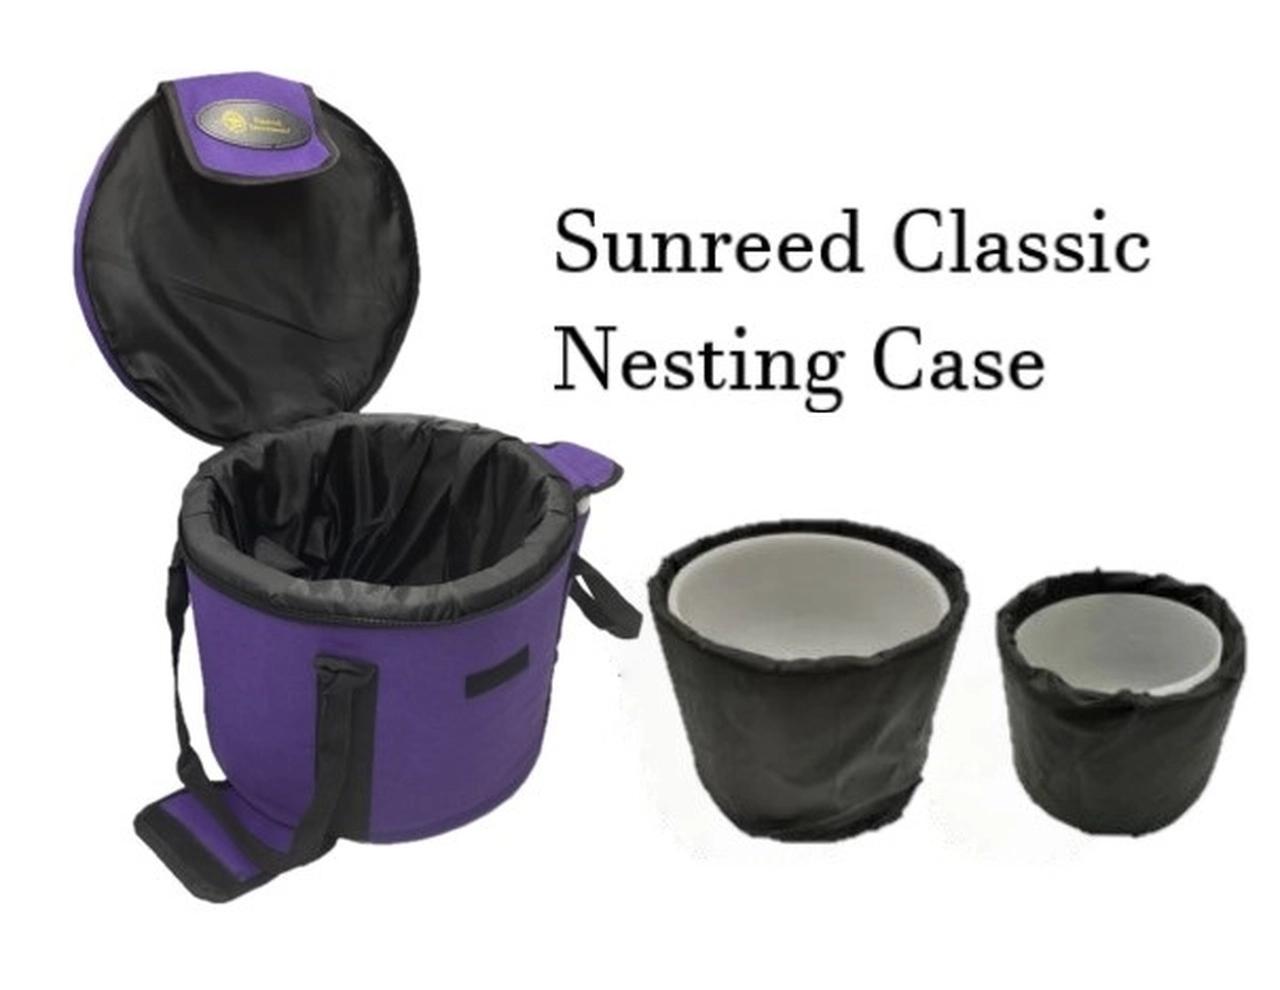 sunreed-classic-nesting-case-1-11595.png